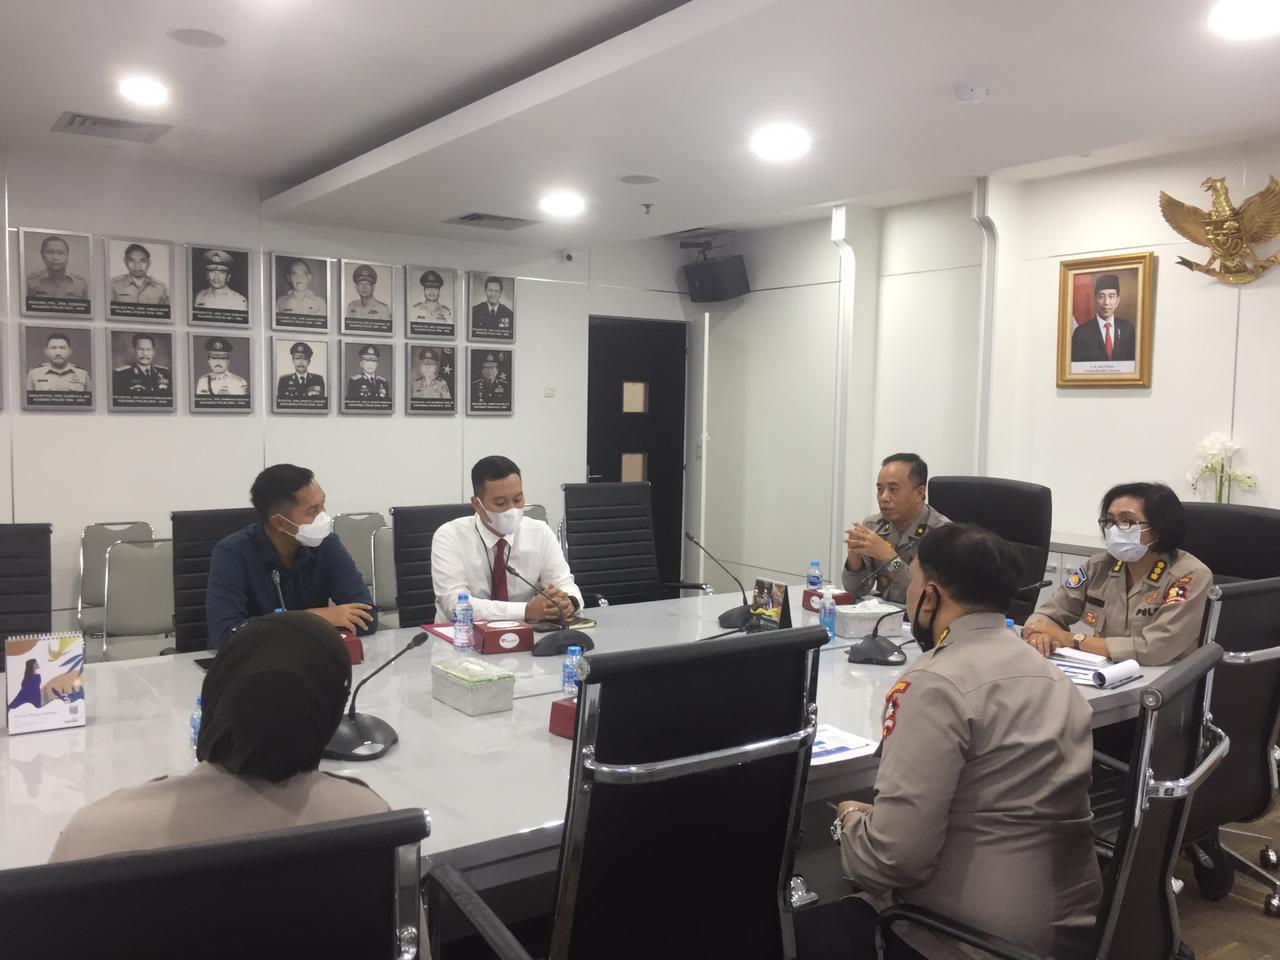 Rapat Koordinasi Puskeu Polri dengan Bank BRI, perihal Pembahasan Restrukturisasi Rekening Benma Polri dari Rekening Giro ke Rekening Virtual Account